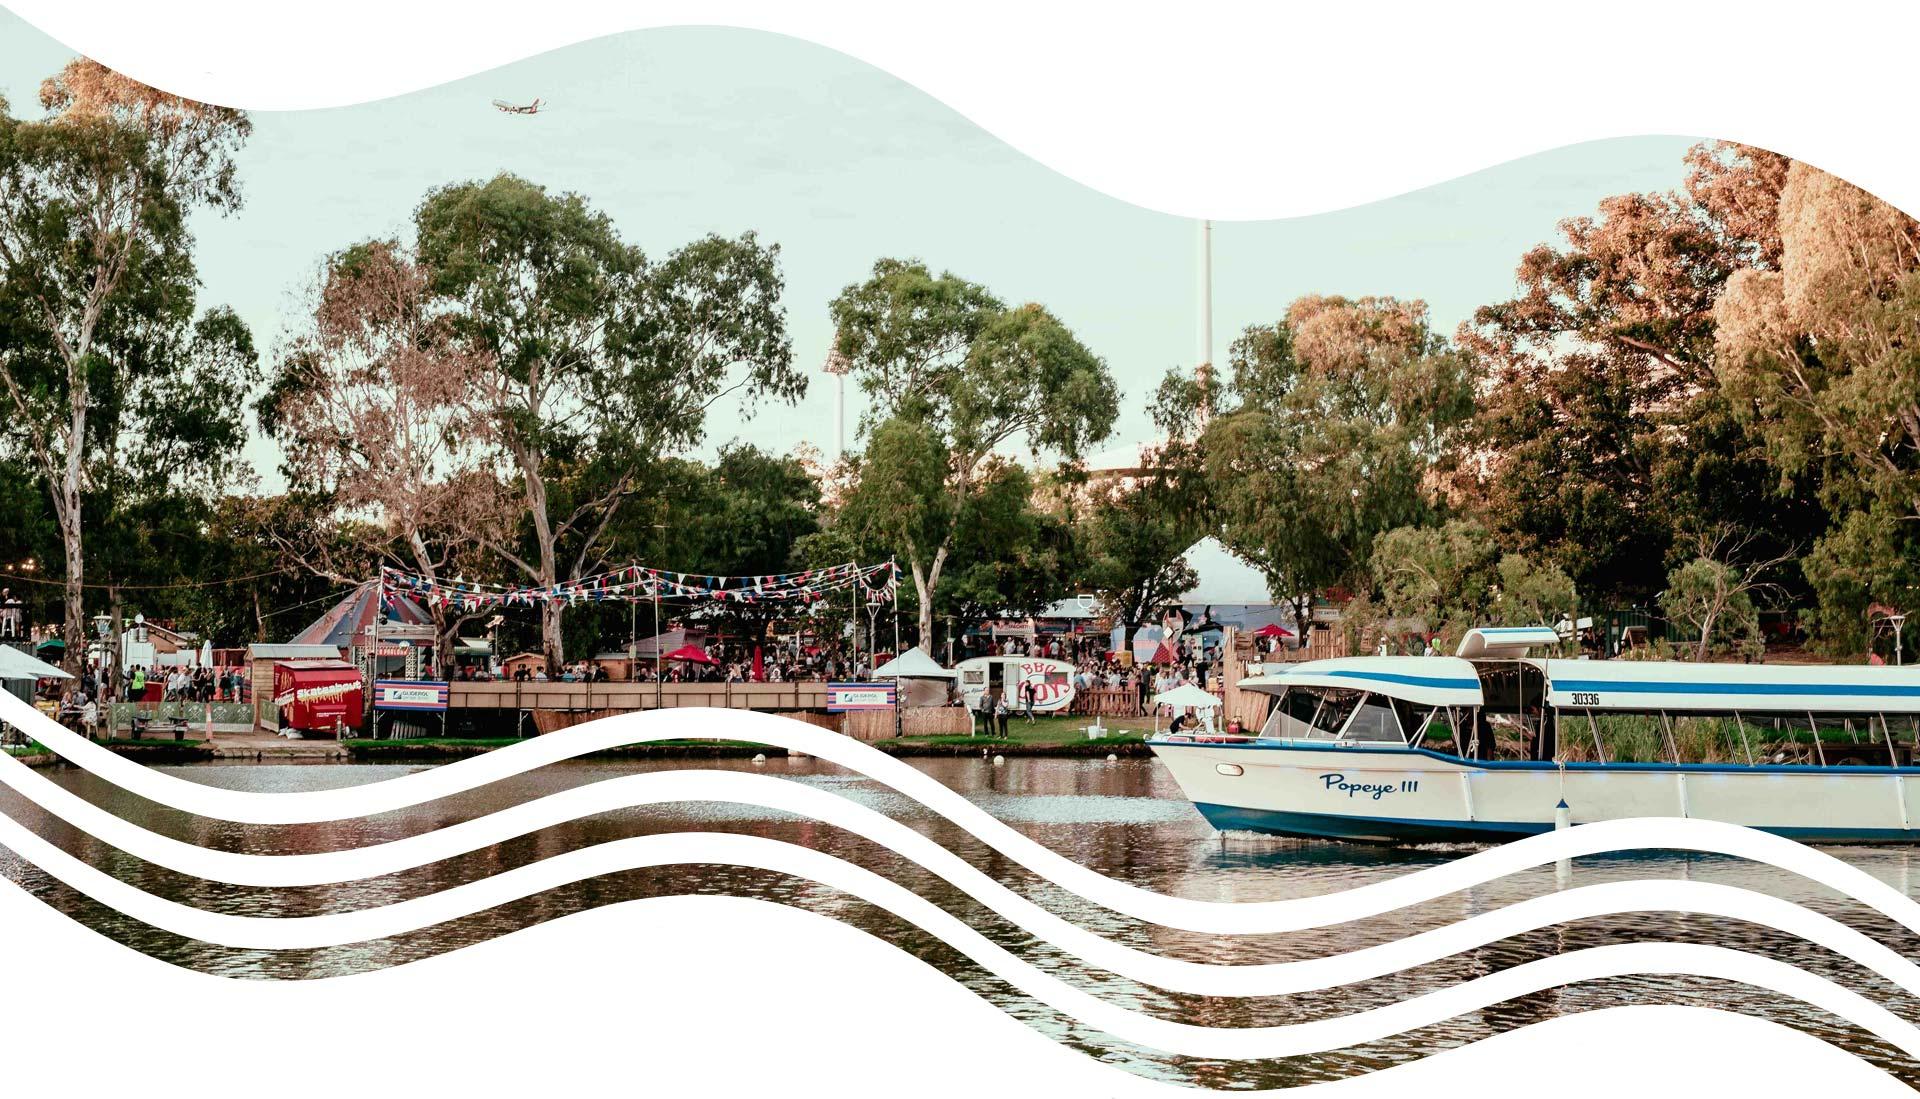 The Popeye Boat